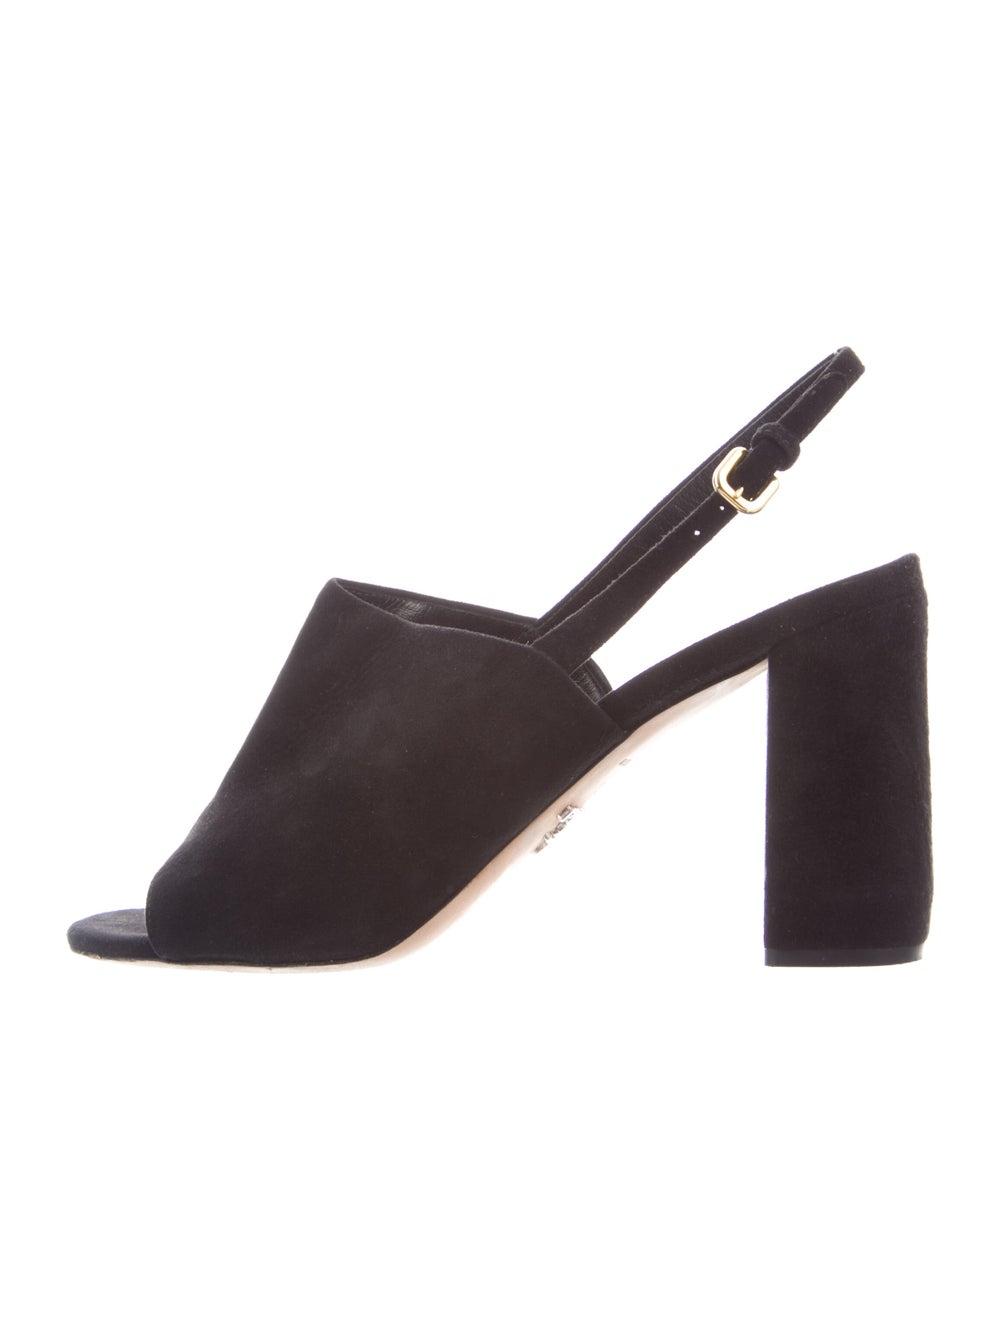 Prada Suede Slingback Sandals Black - image 1